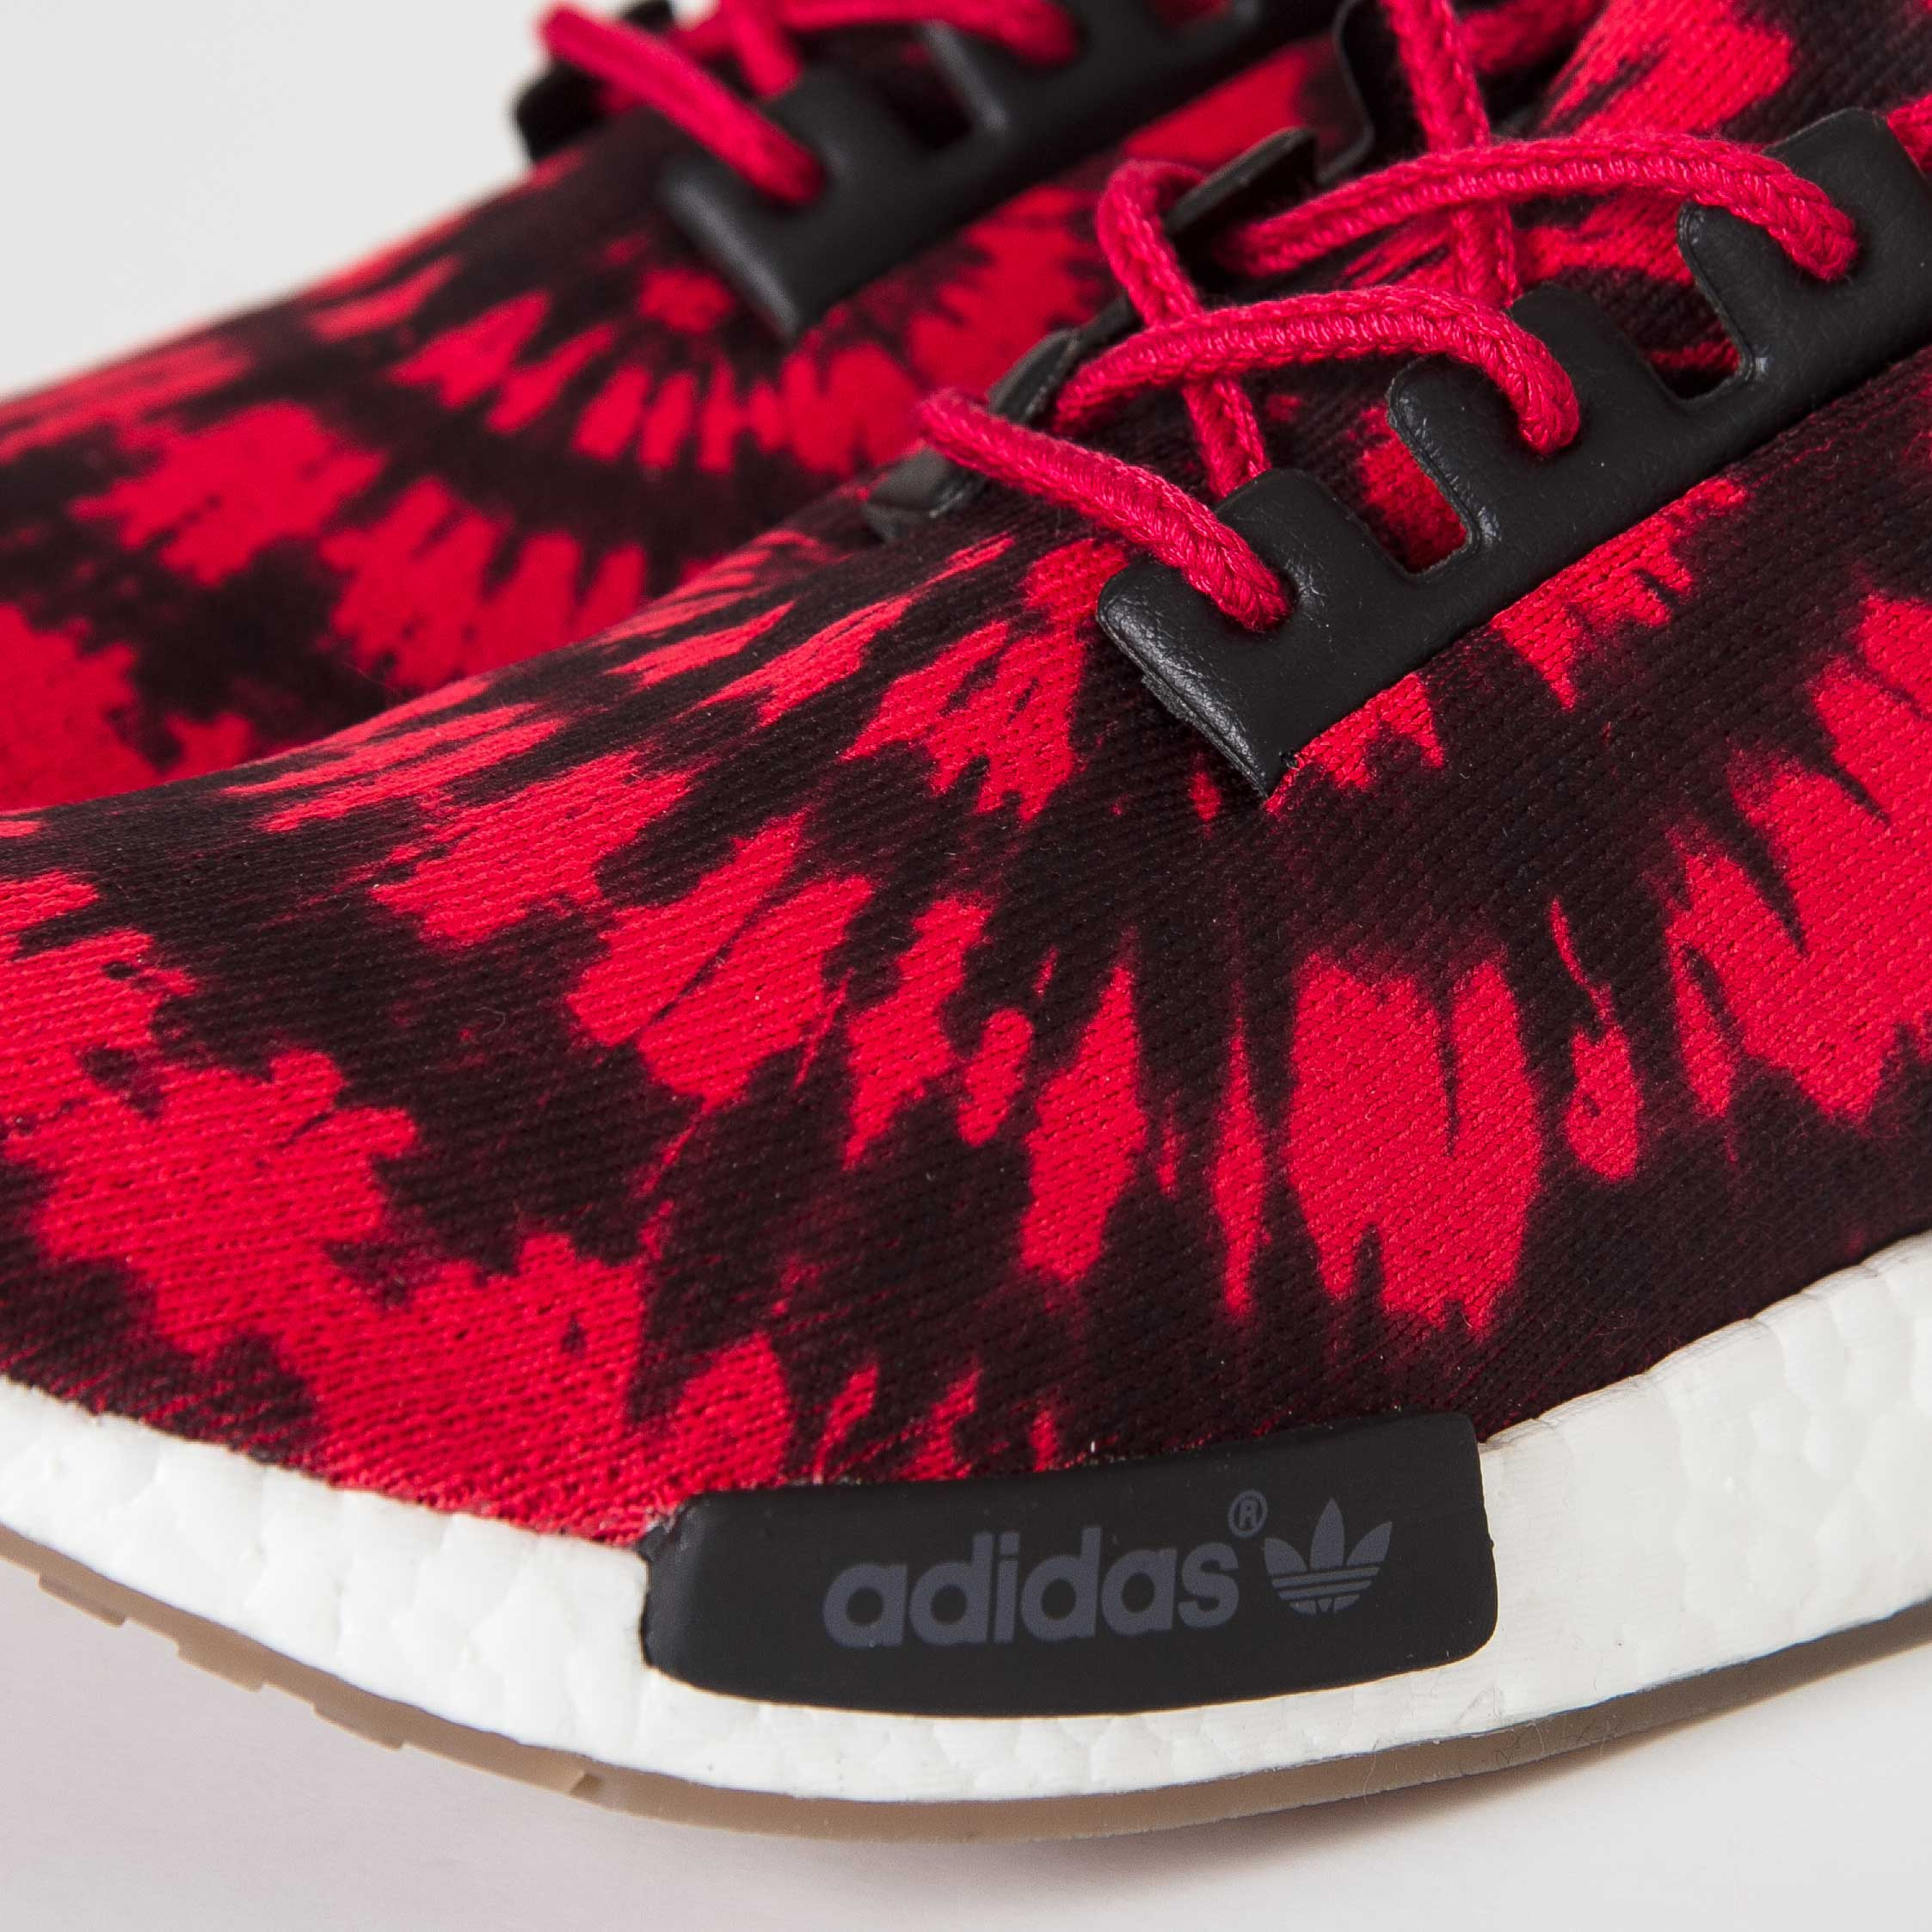 181b12e4a adidas NMD R1 PK x Nice Kicks - Aq4791 - Sneakersnstuff